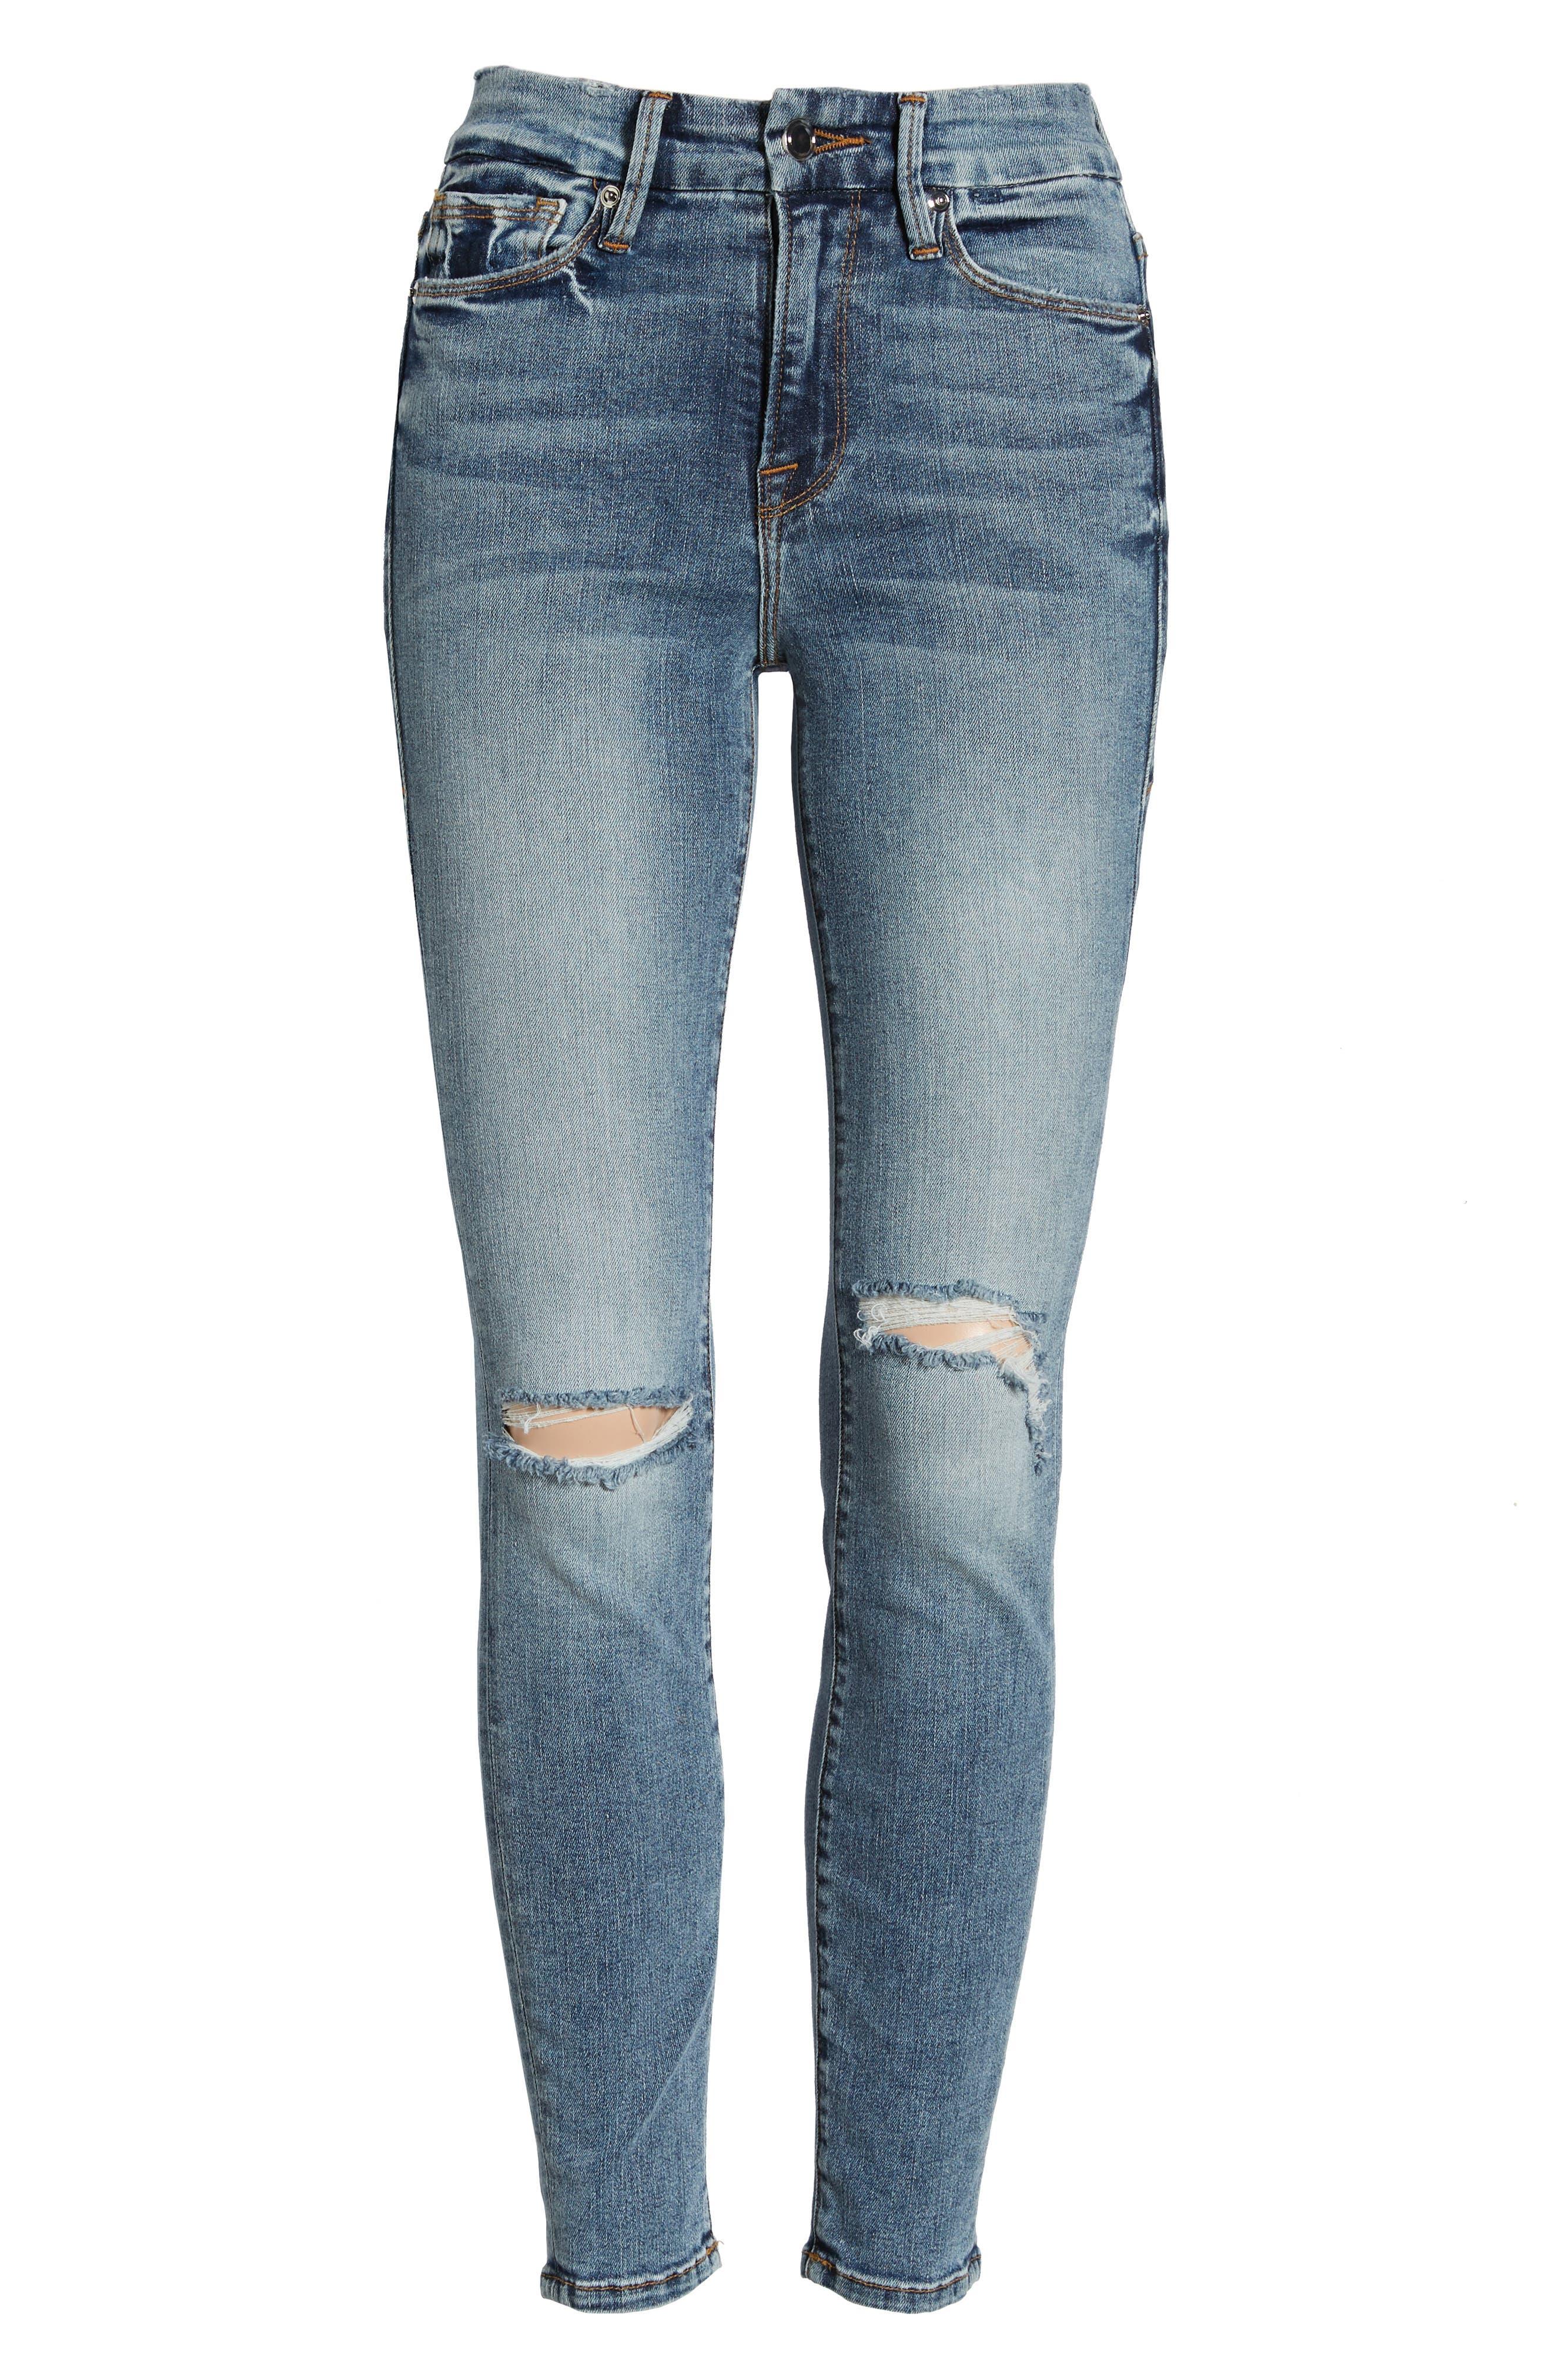 Good Legs Ankle Skinny Jeans,                             Alternate thumbnail 7, color,                             BLUE 129